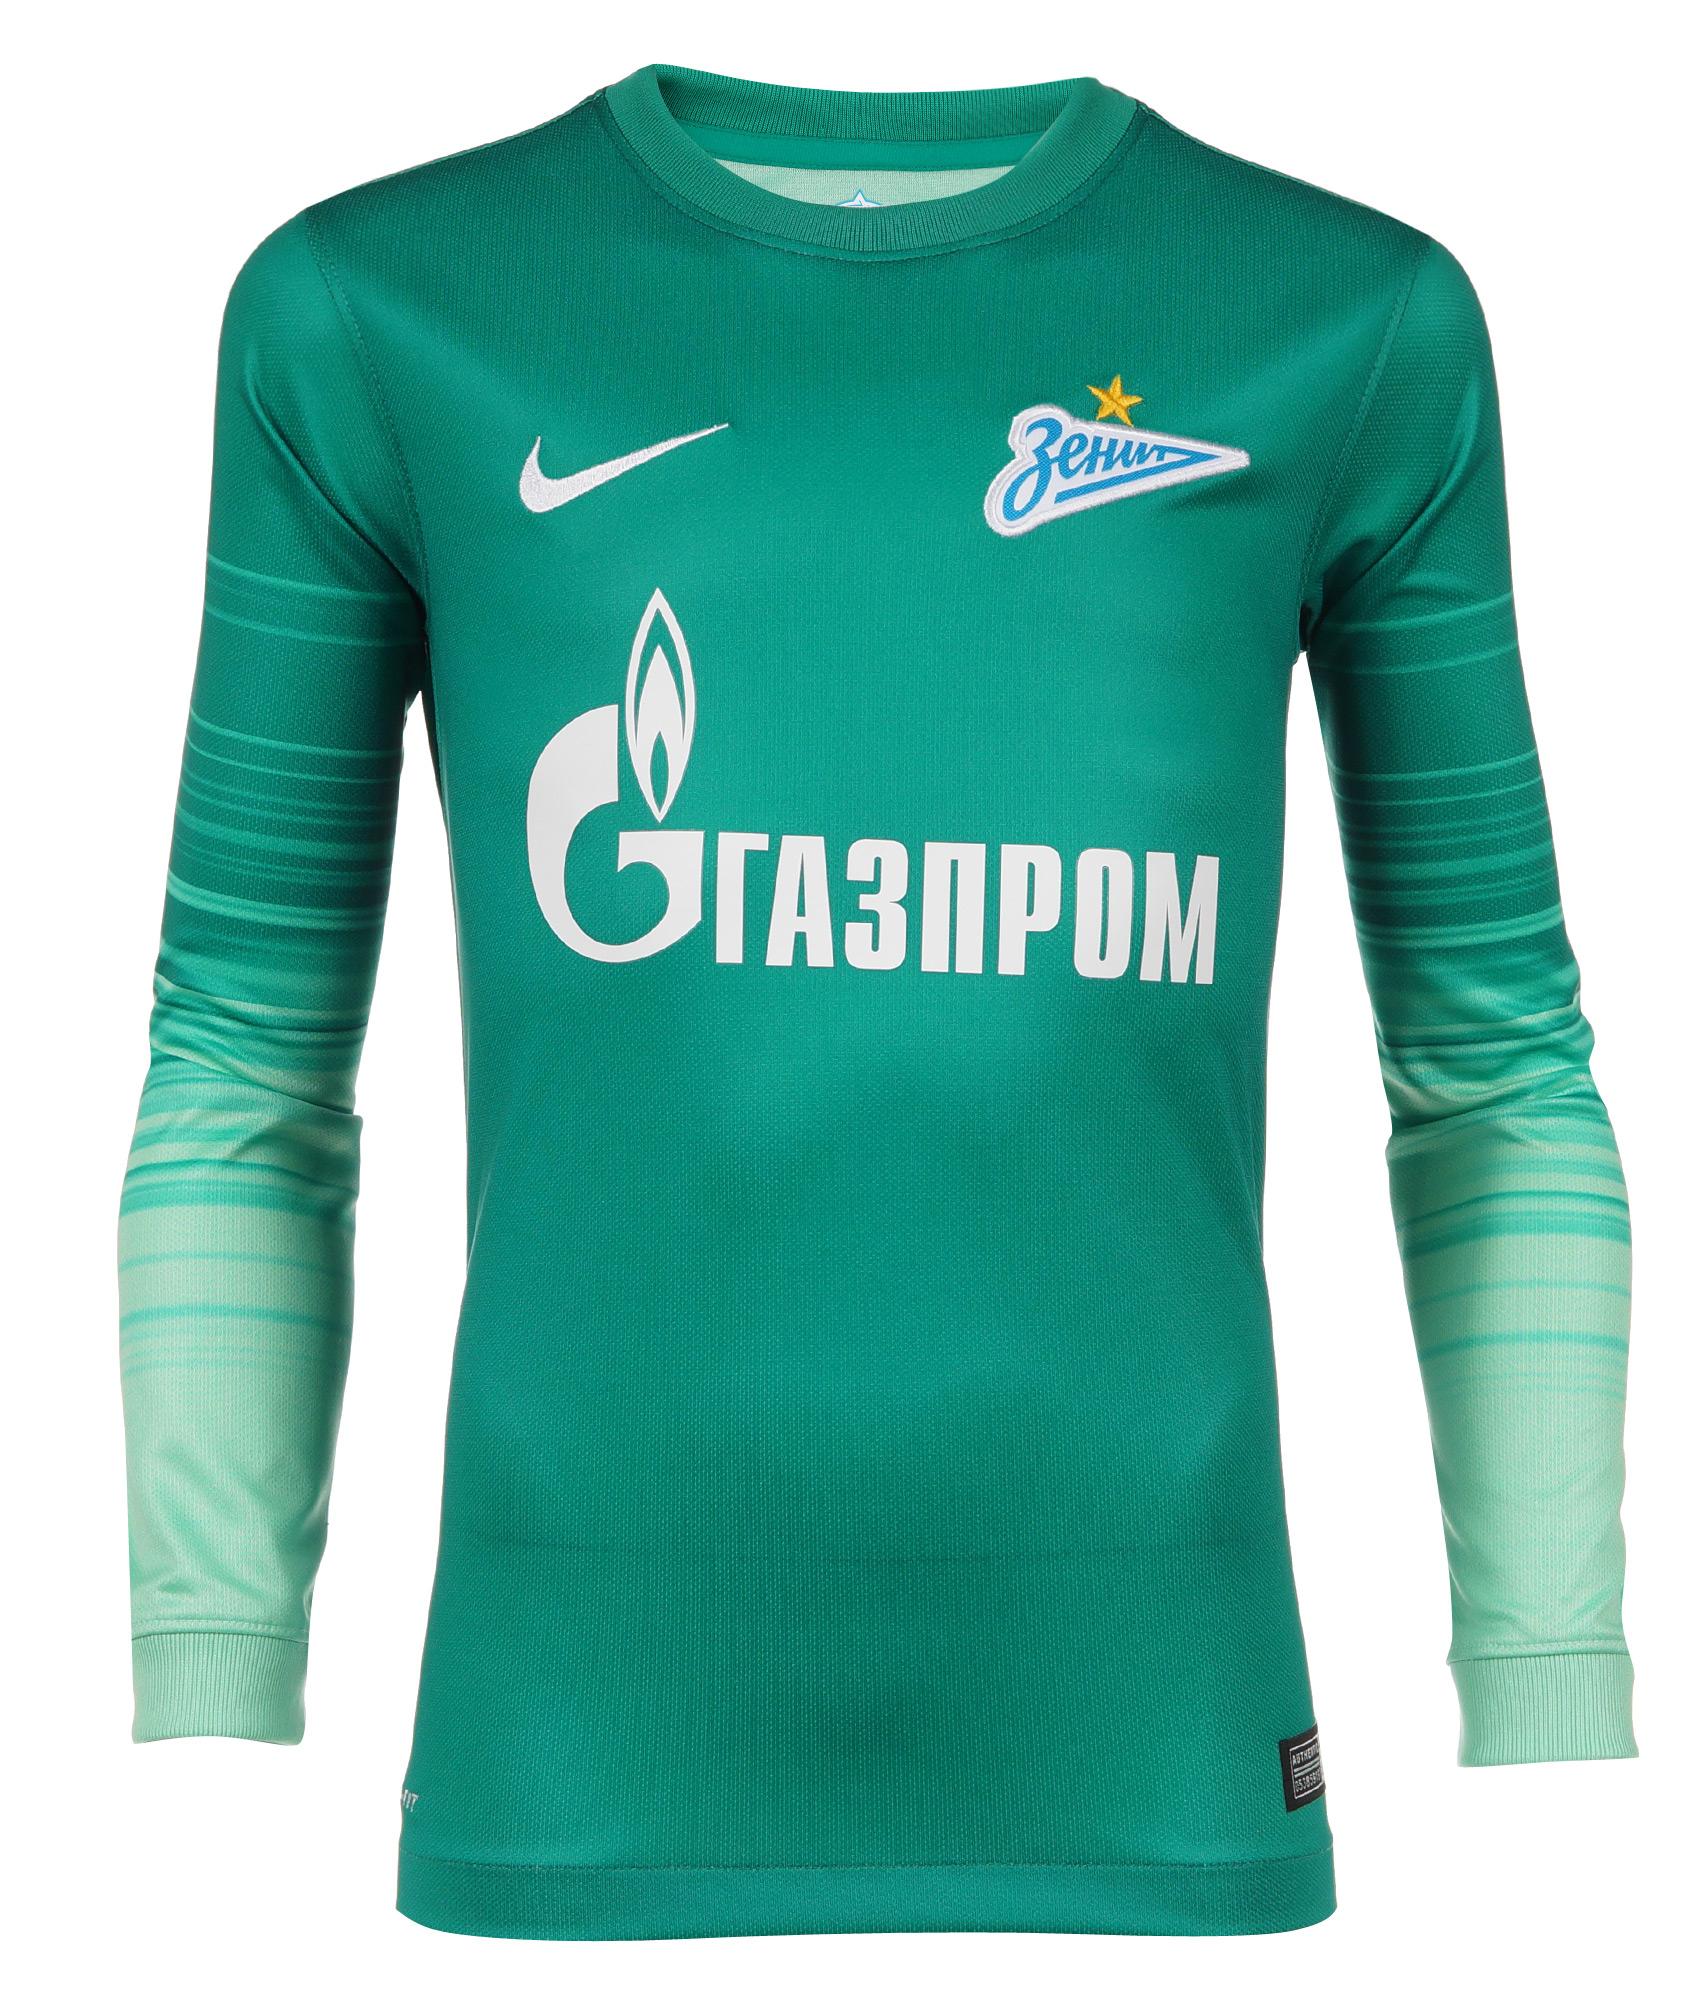 Вратарская подростковая футболка, Цвет-Зеленый, Размер-S